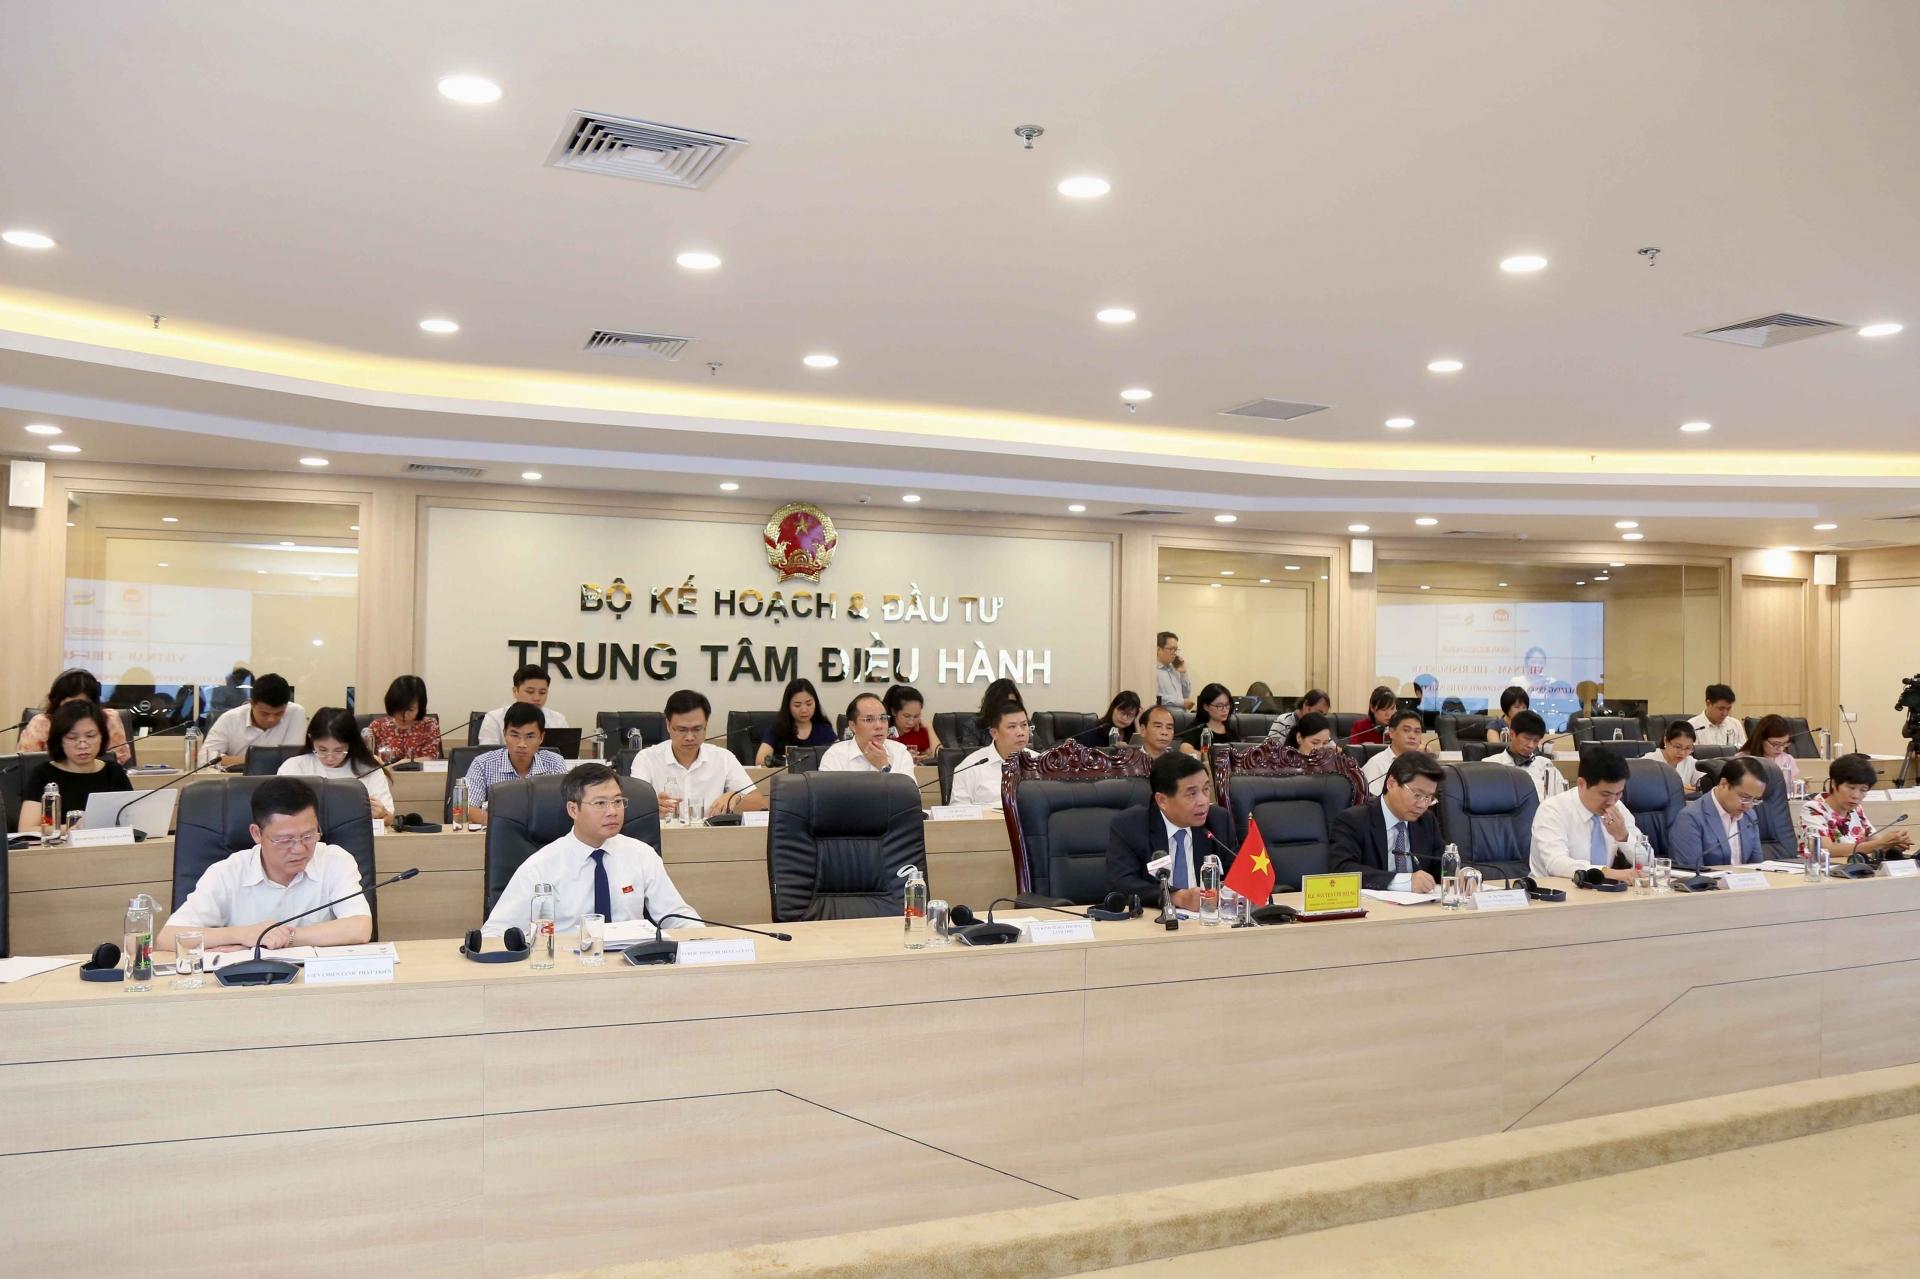 standard chartered online forum highlights vietnam as rising star in fdi